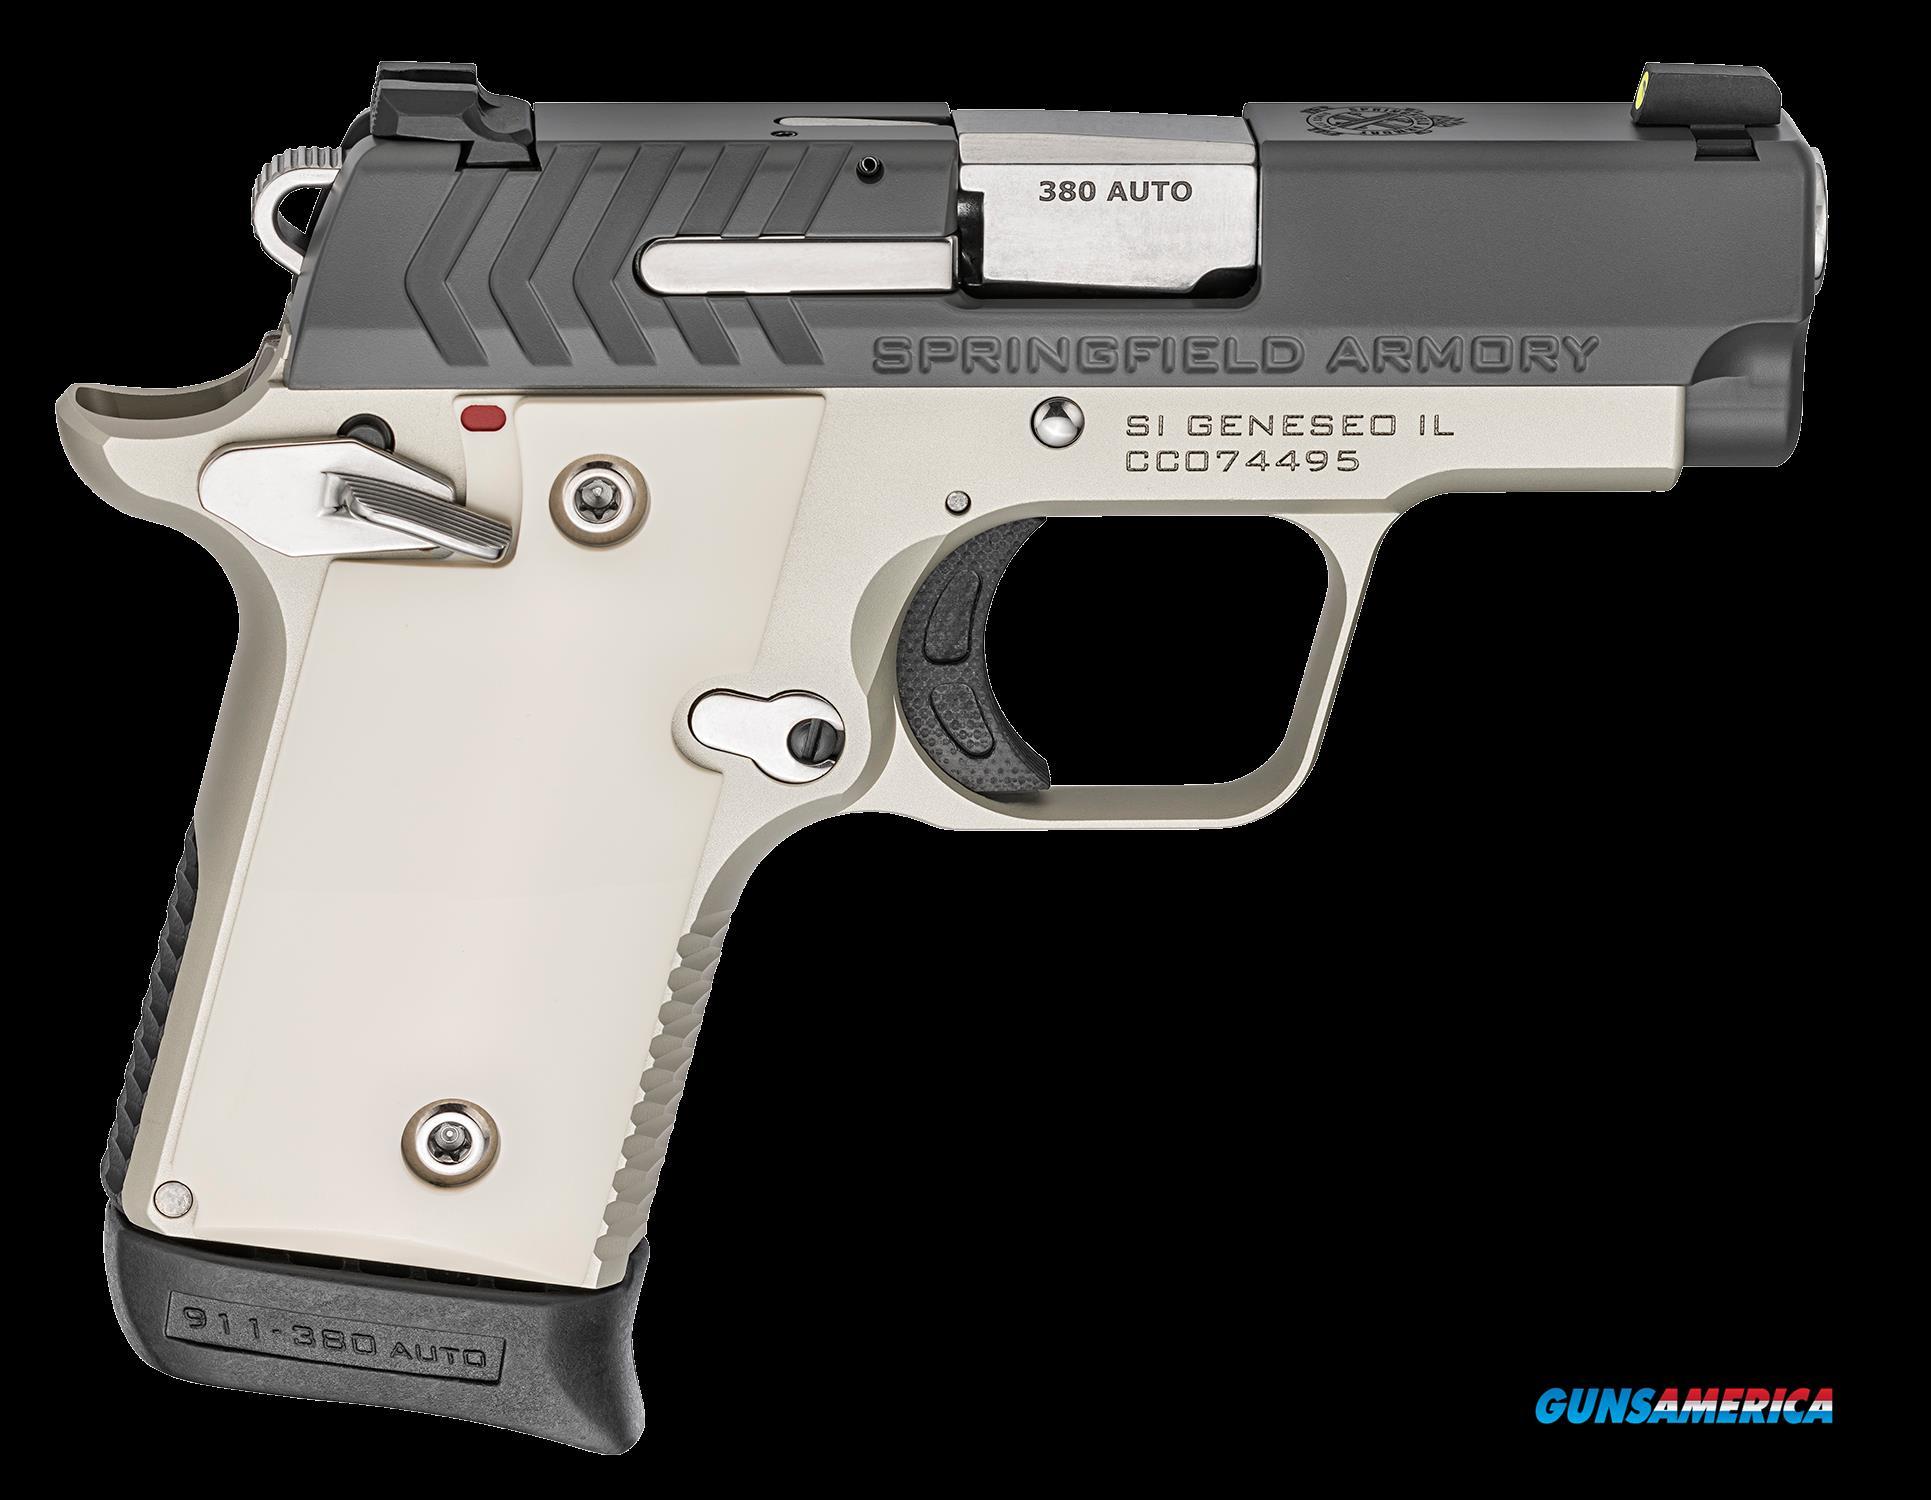 Springfield Armory 911, Spg Pg9109pg      380 911 2.7 Platinum Grph  6-7r  Guns > Pistols > 1911 Pistol Copies (non-Colt)